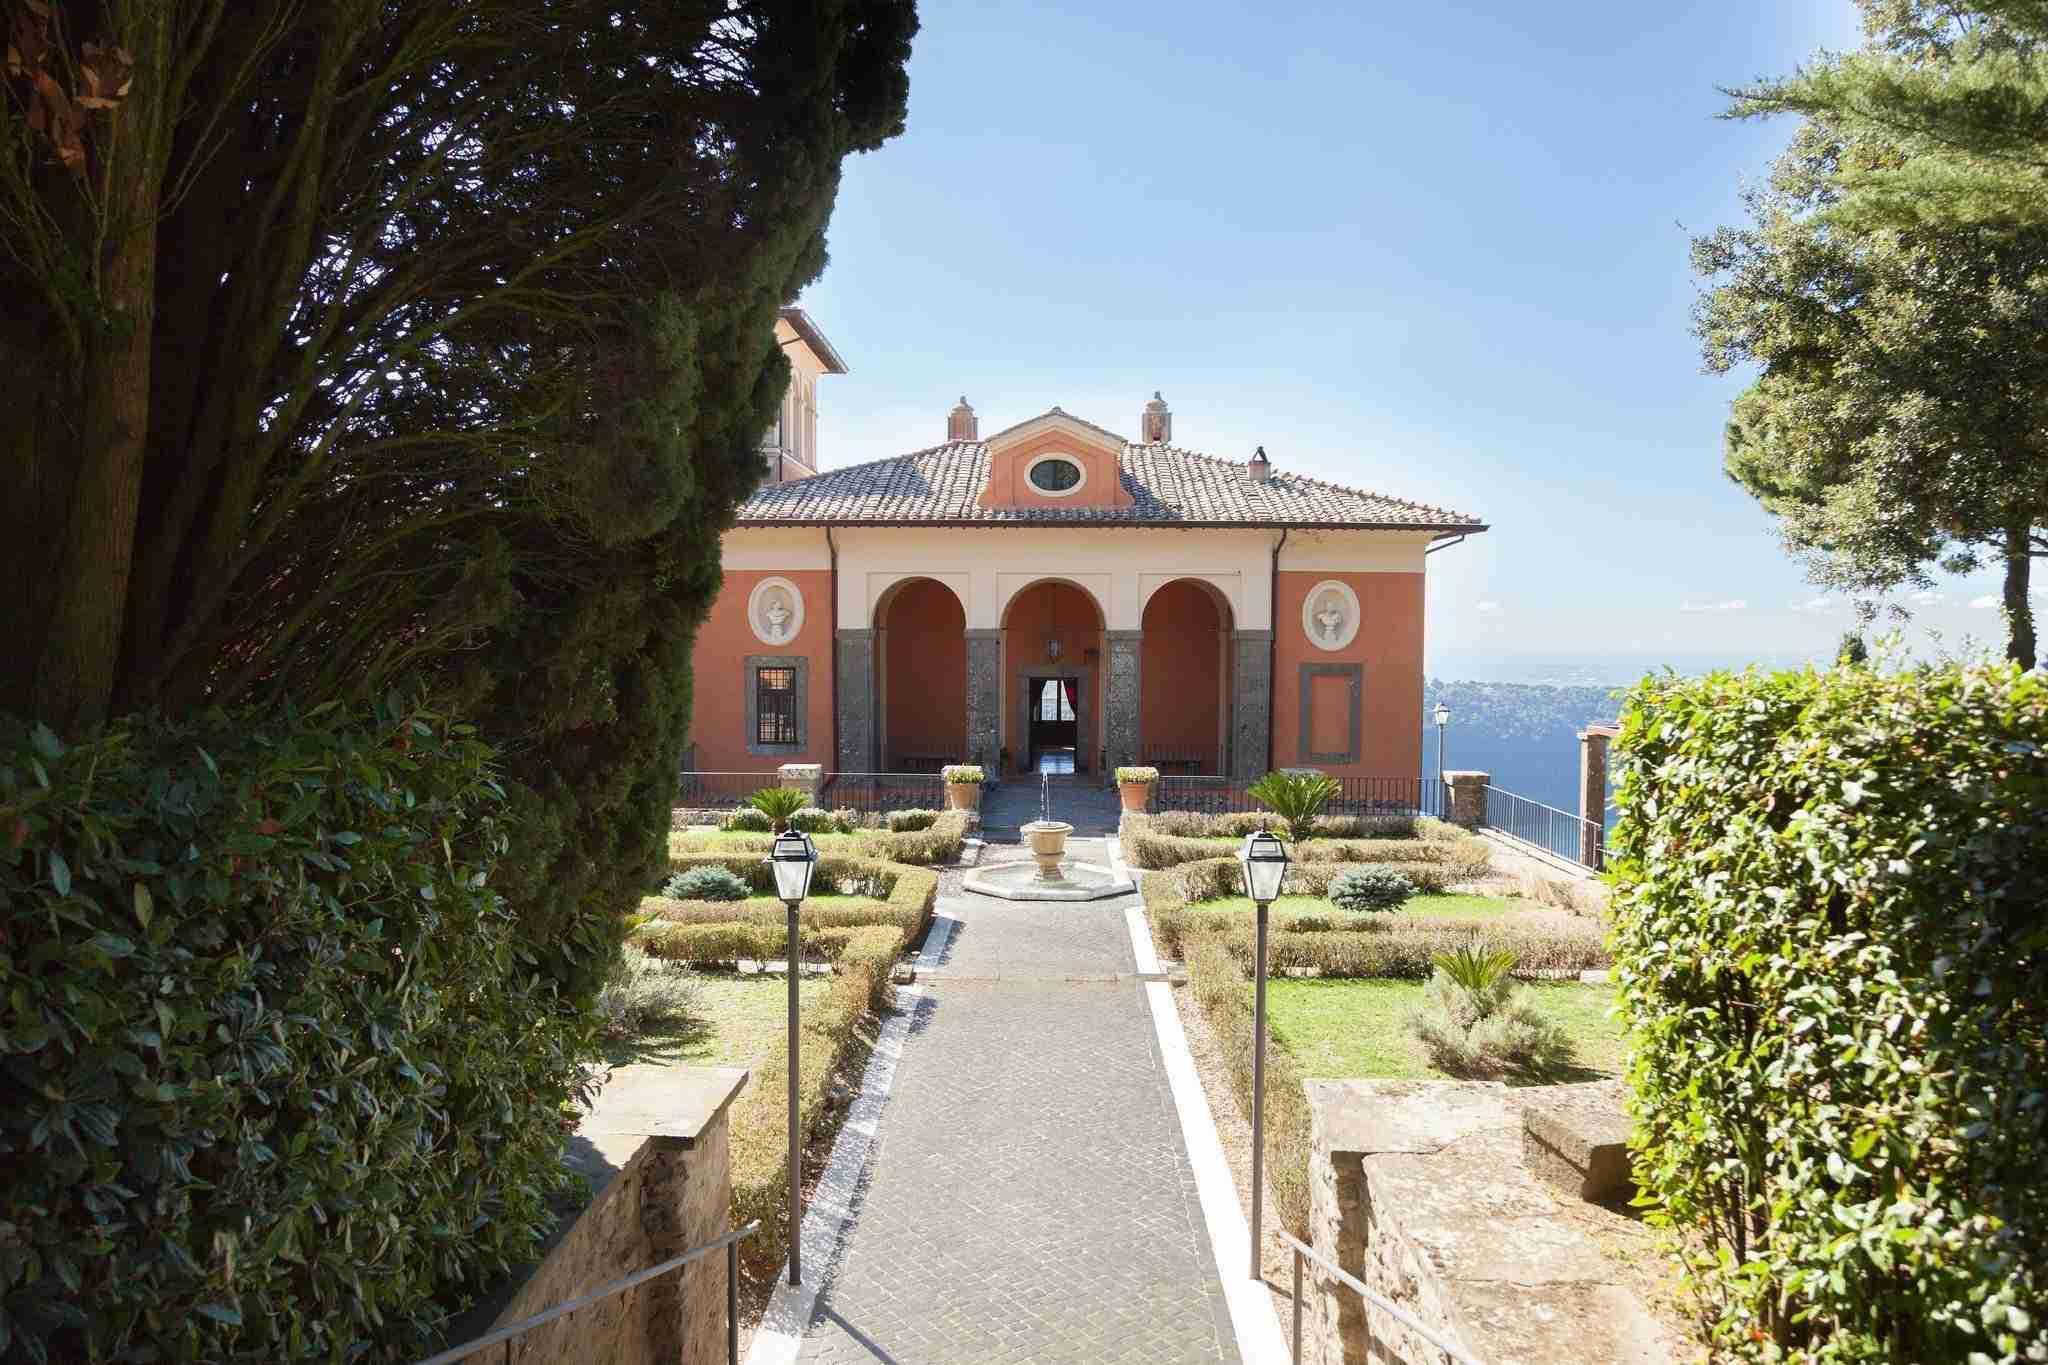 Villa per Matrimoni Cardinali - Giardino